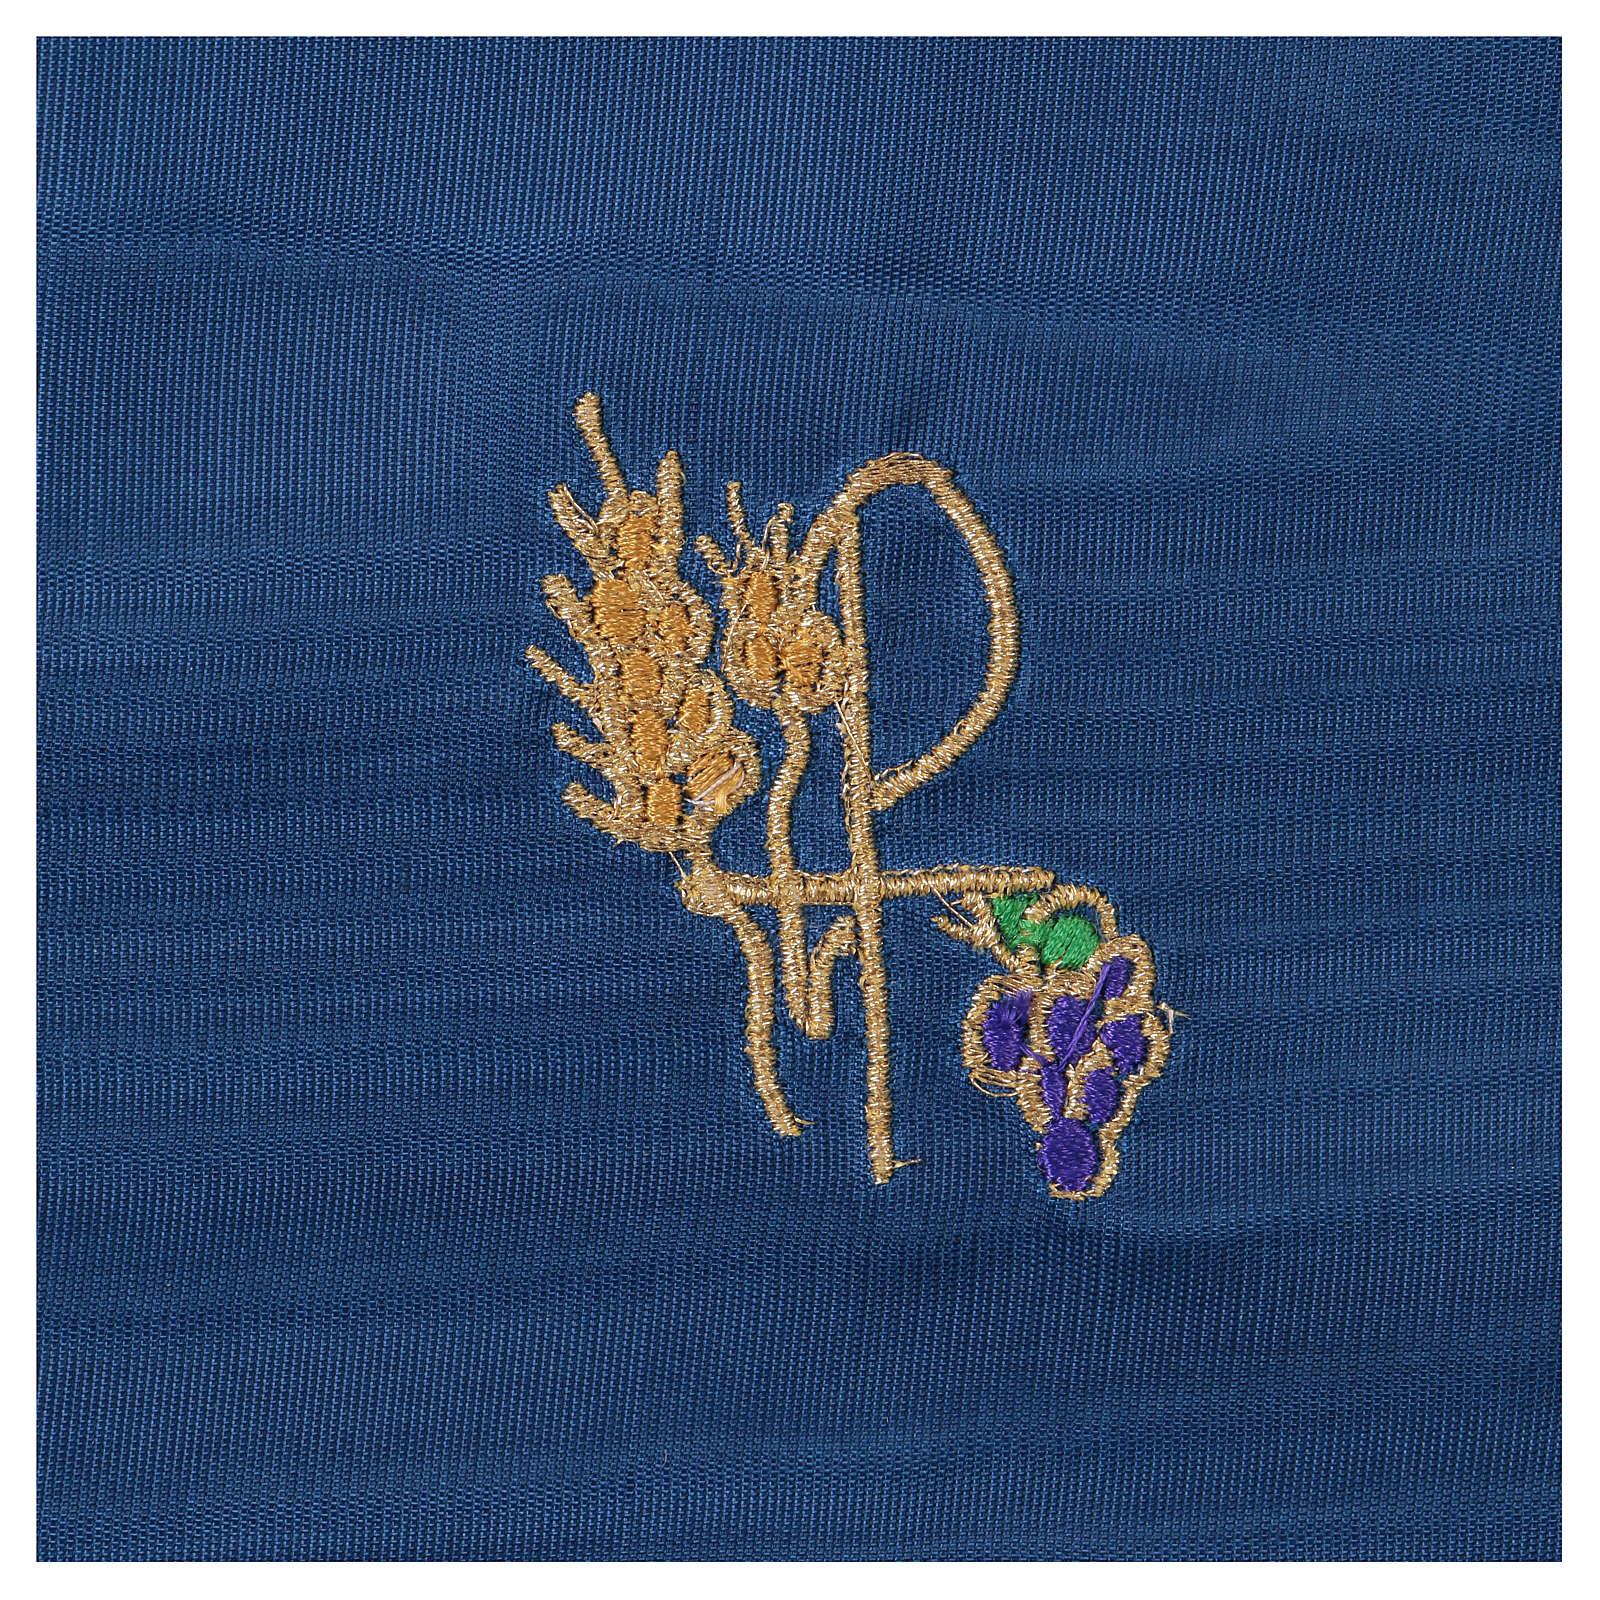 Cubre cáliz (palia) XP uva y espiga tejido azul 4